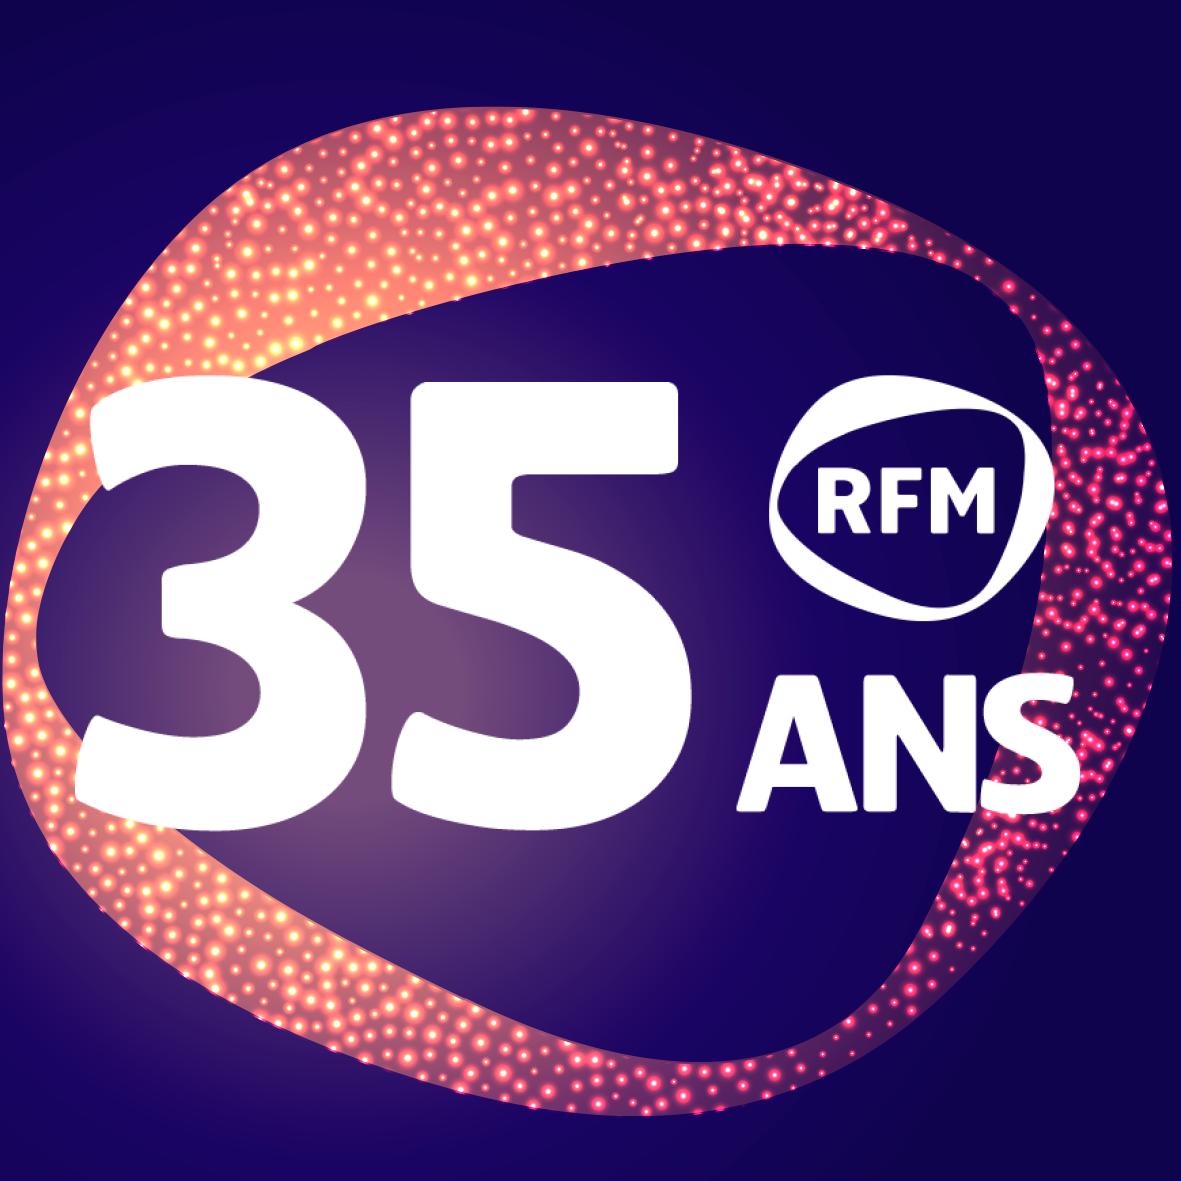 Aujourd'hui lundi, RFM a 35 ans